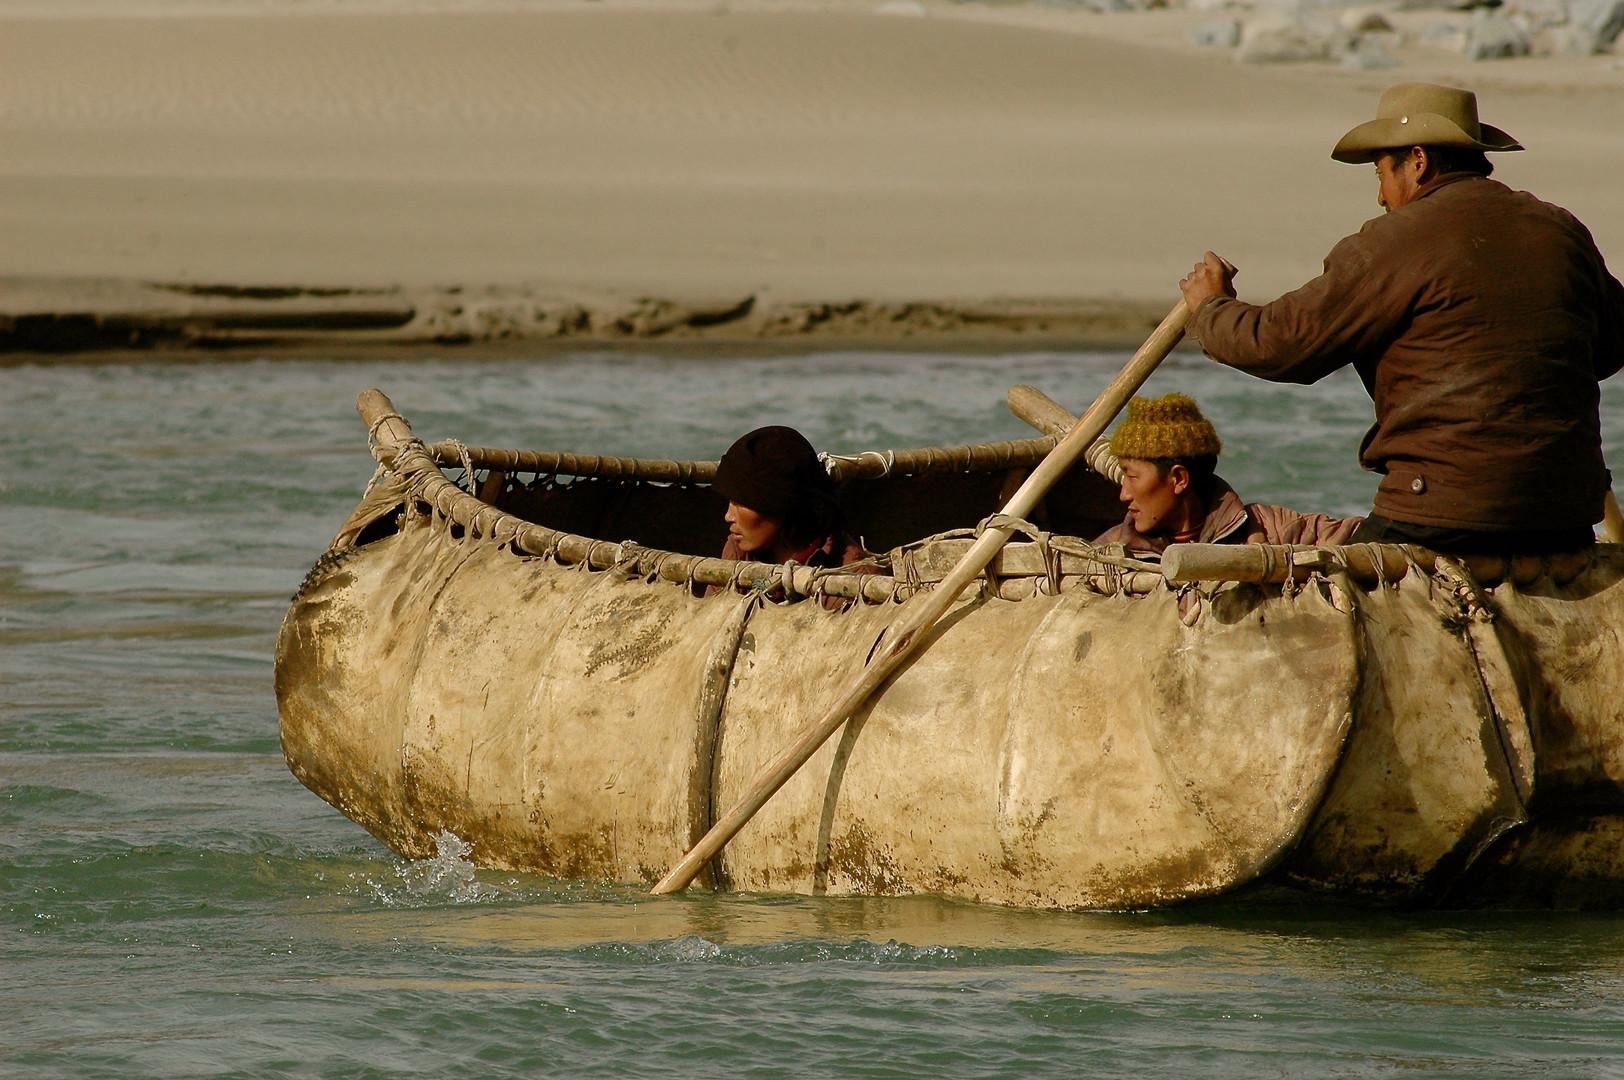 Yak Skin Boat - Tibet